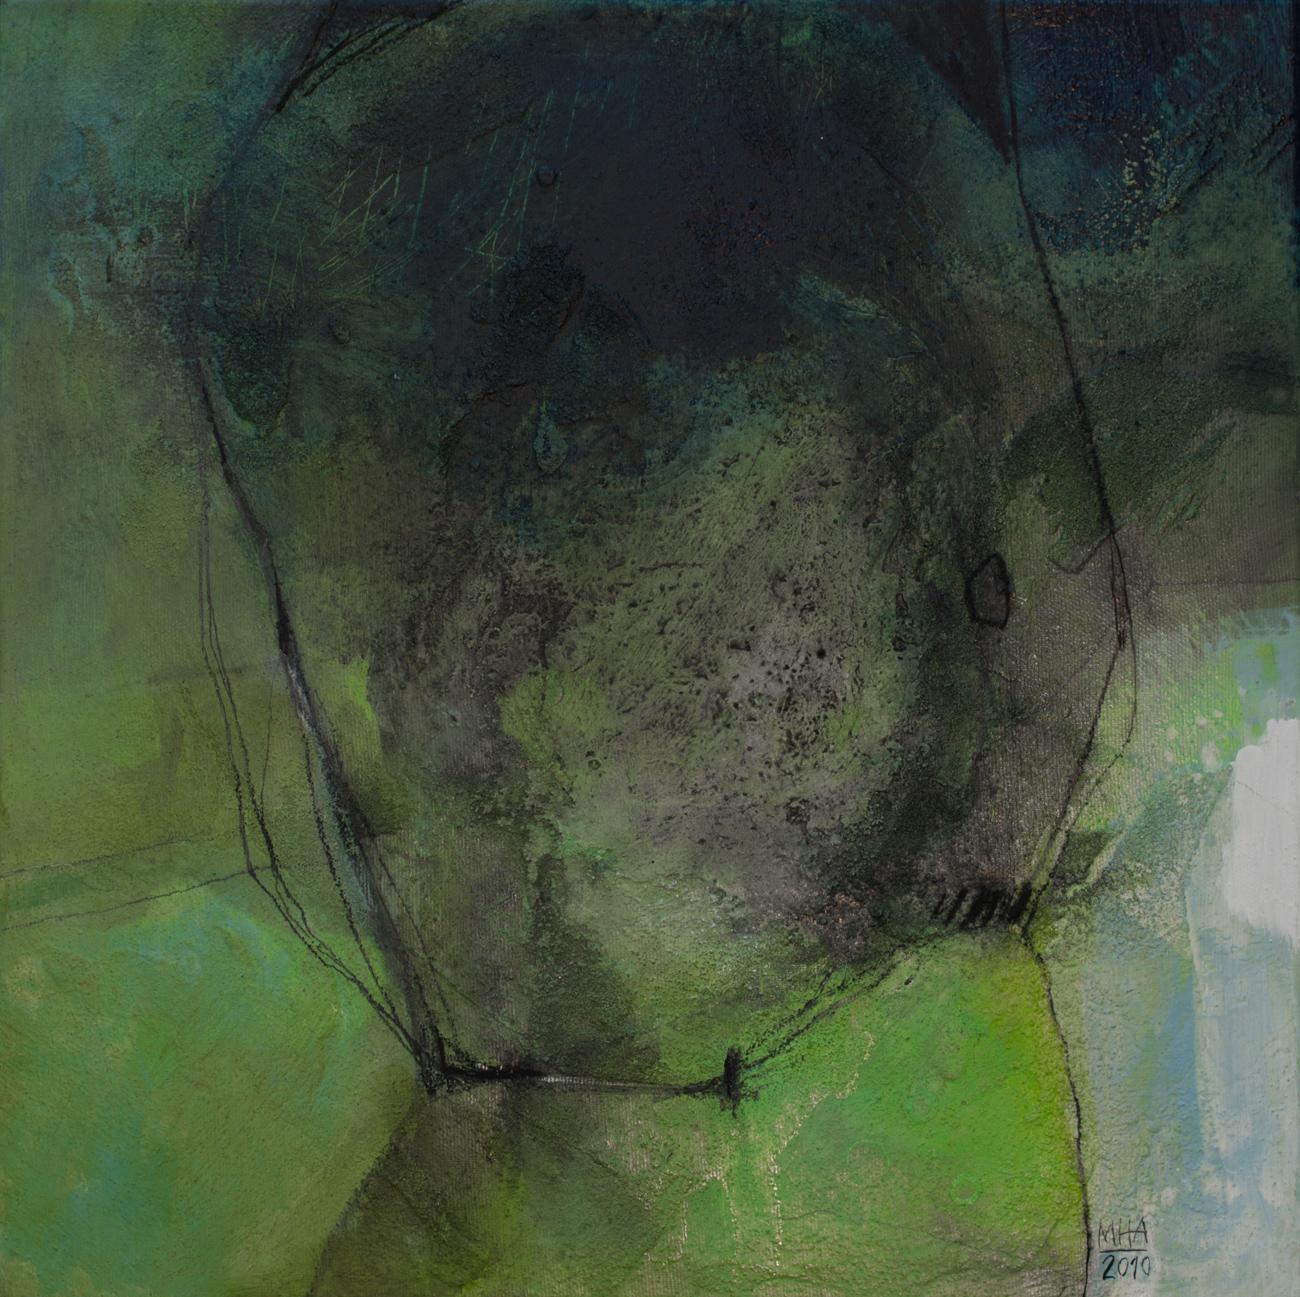 Kopf Nr. 1  ,  2011, Acryl auf Leinwand – Mischtechnik , 40x40 cm